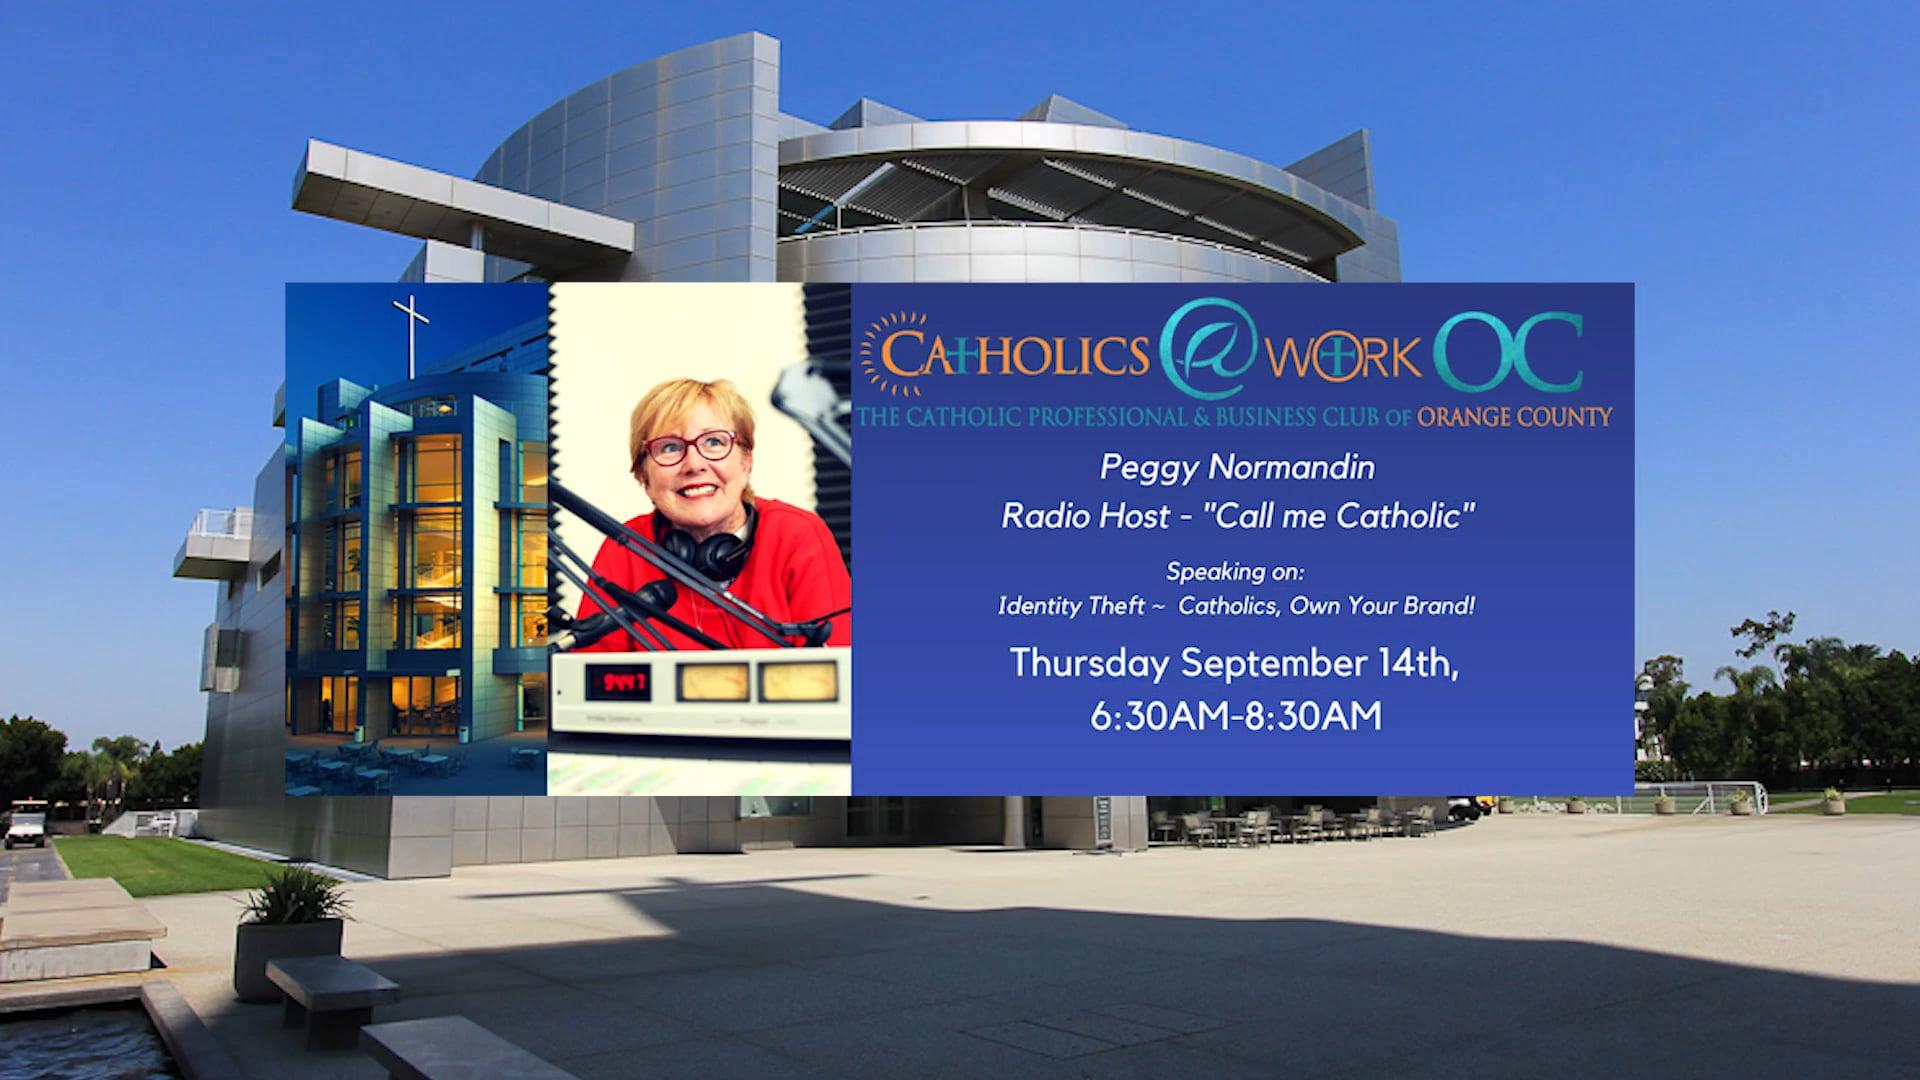 Catholics @ Work OC - Peggy Normandin